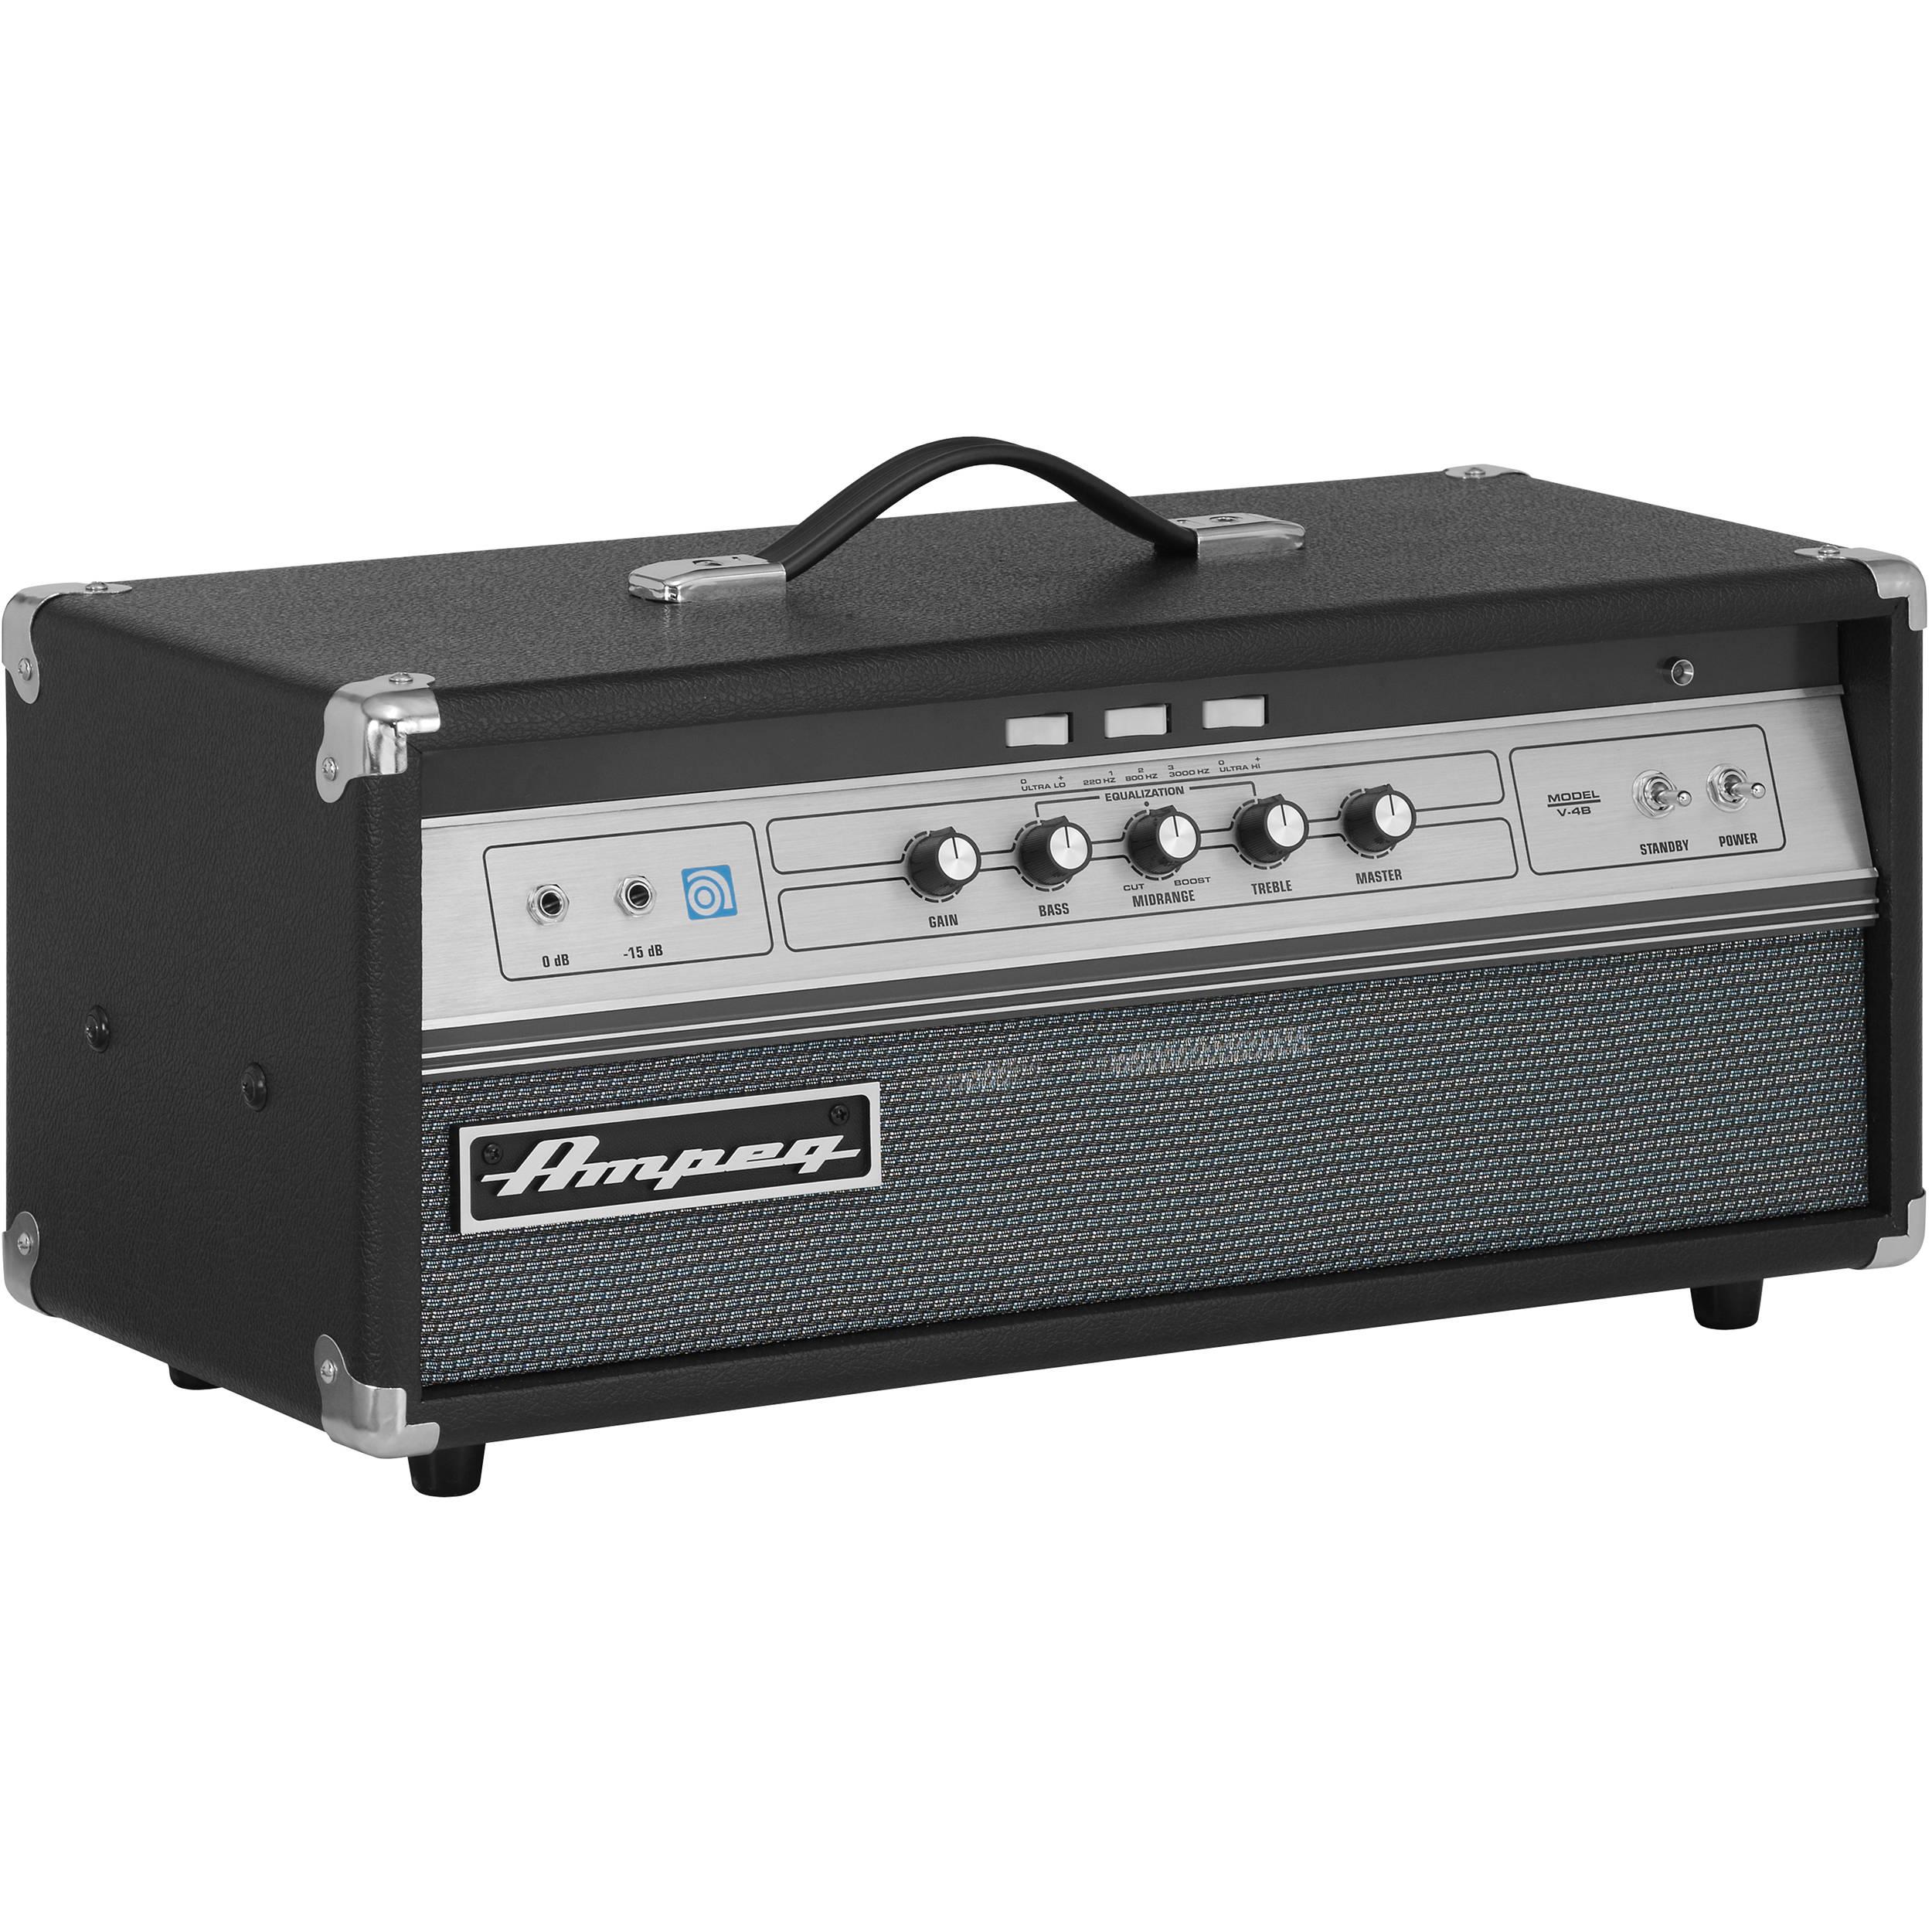 ampeg v 4b 100 watt all tube bass amplifier head v 4b b h photo. Black Bedroom Furniture Sets. Home Design Ideas